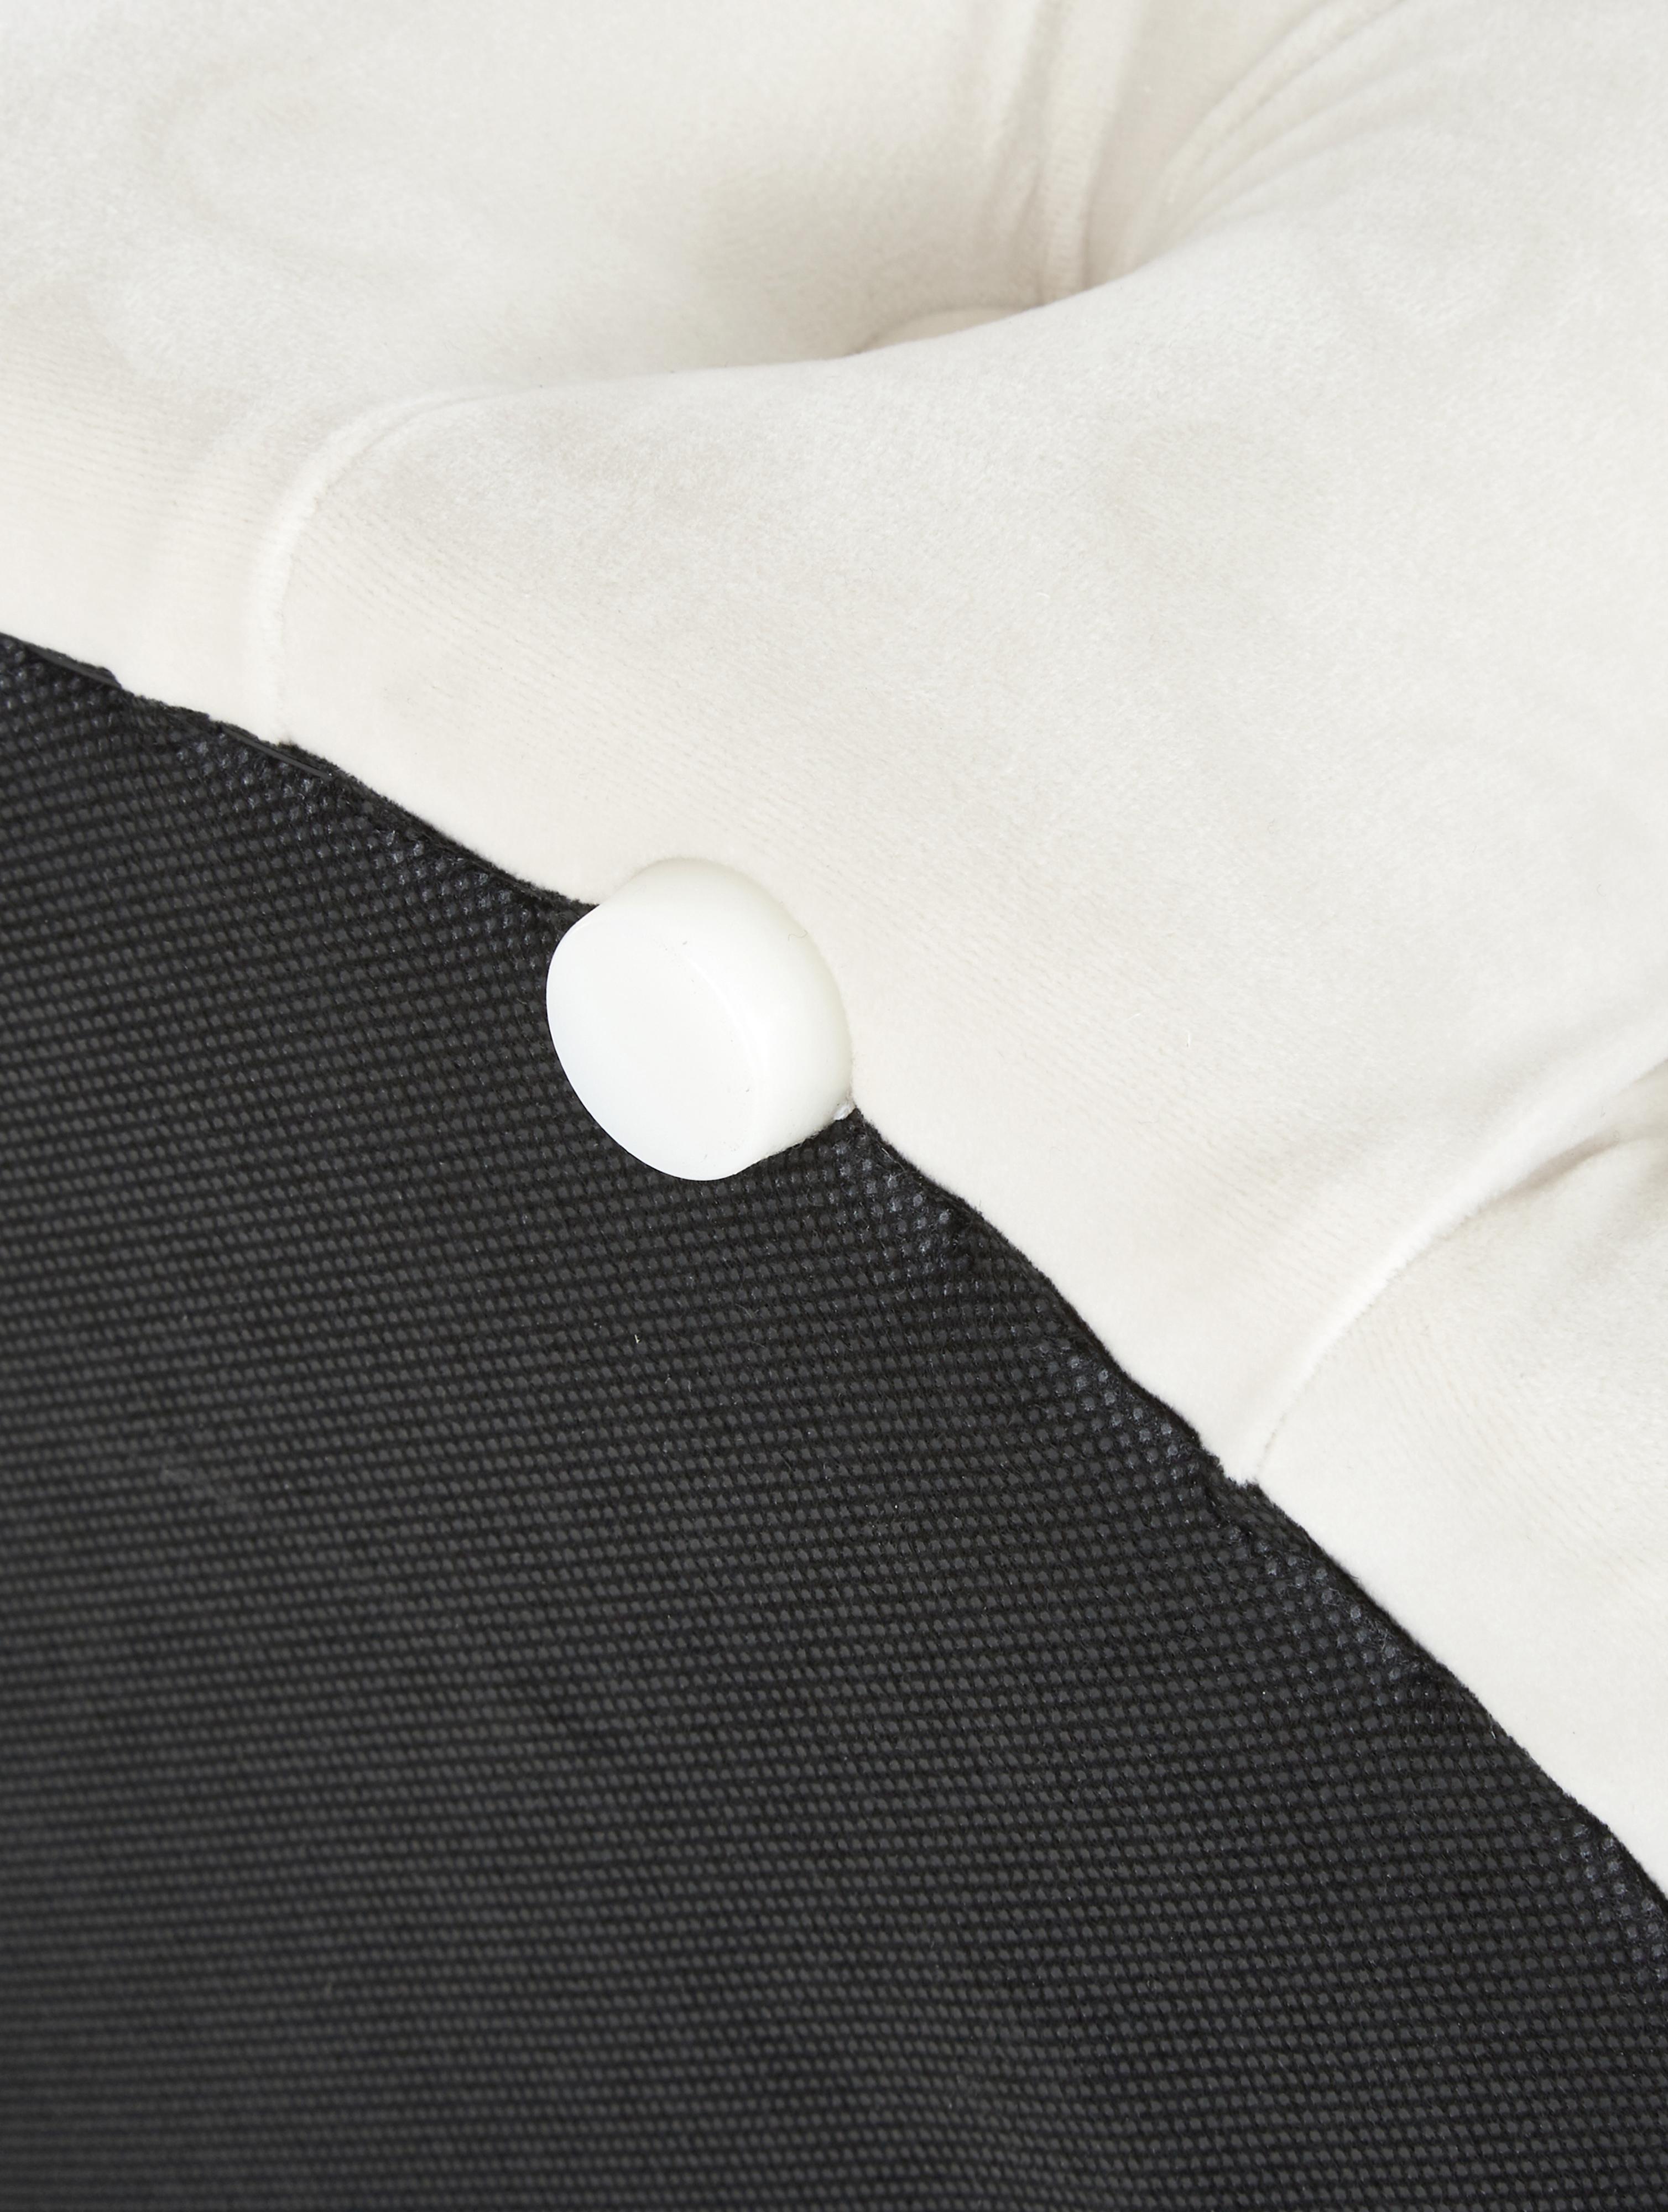 Samt-Hocker Chiara mit Stauraum, Bezug: Samt (Polyester) 20.000 S, Korpus: Eukalyptusholz, Cremeweiß, Ø 50 x H 40 cm